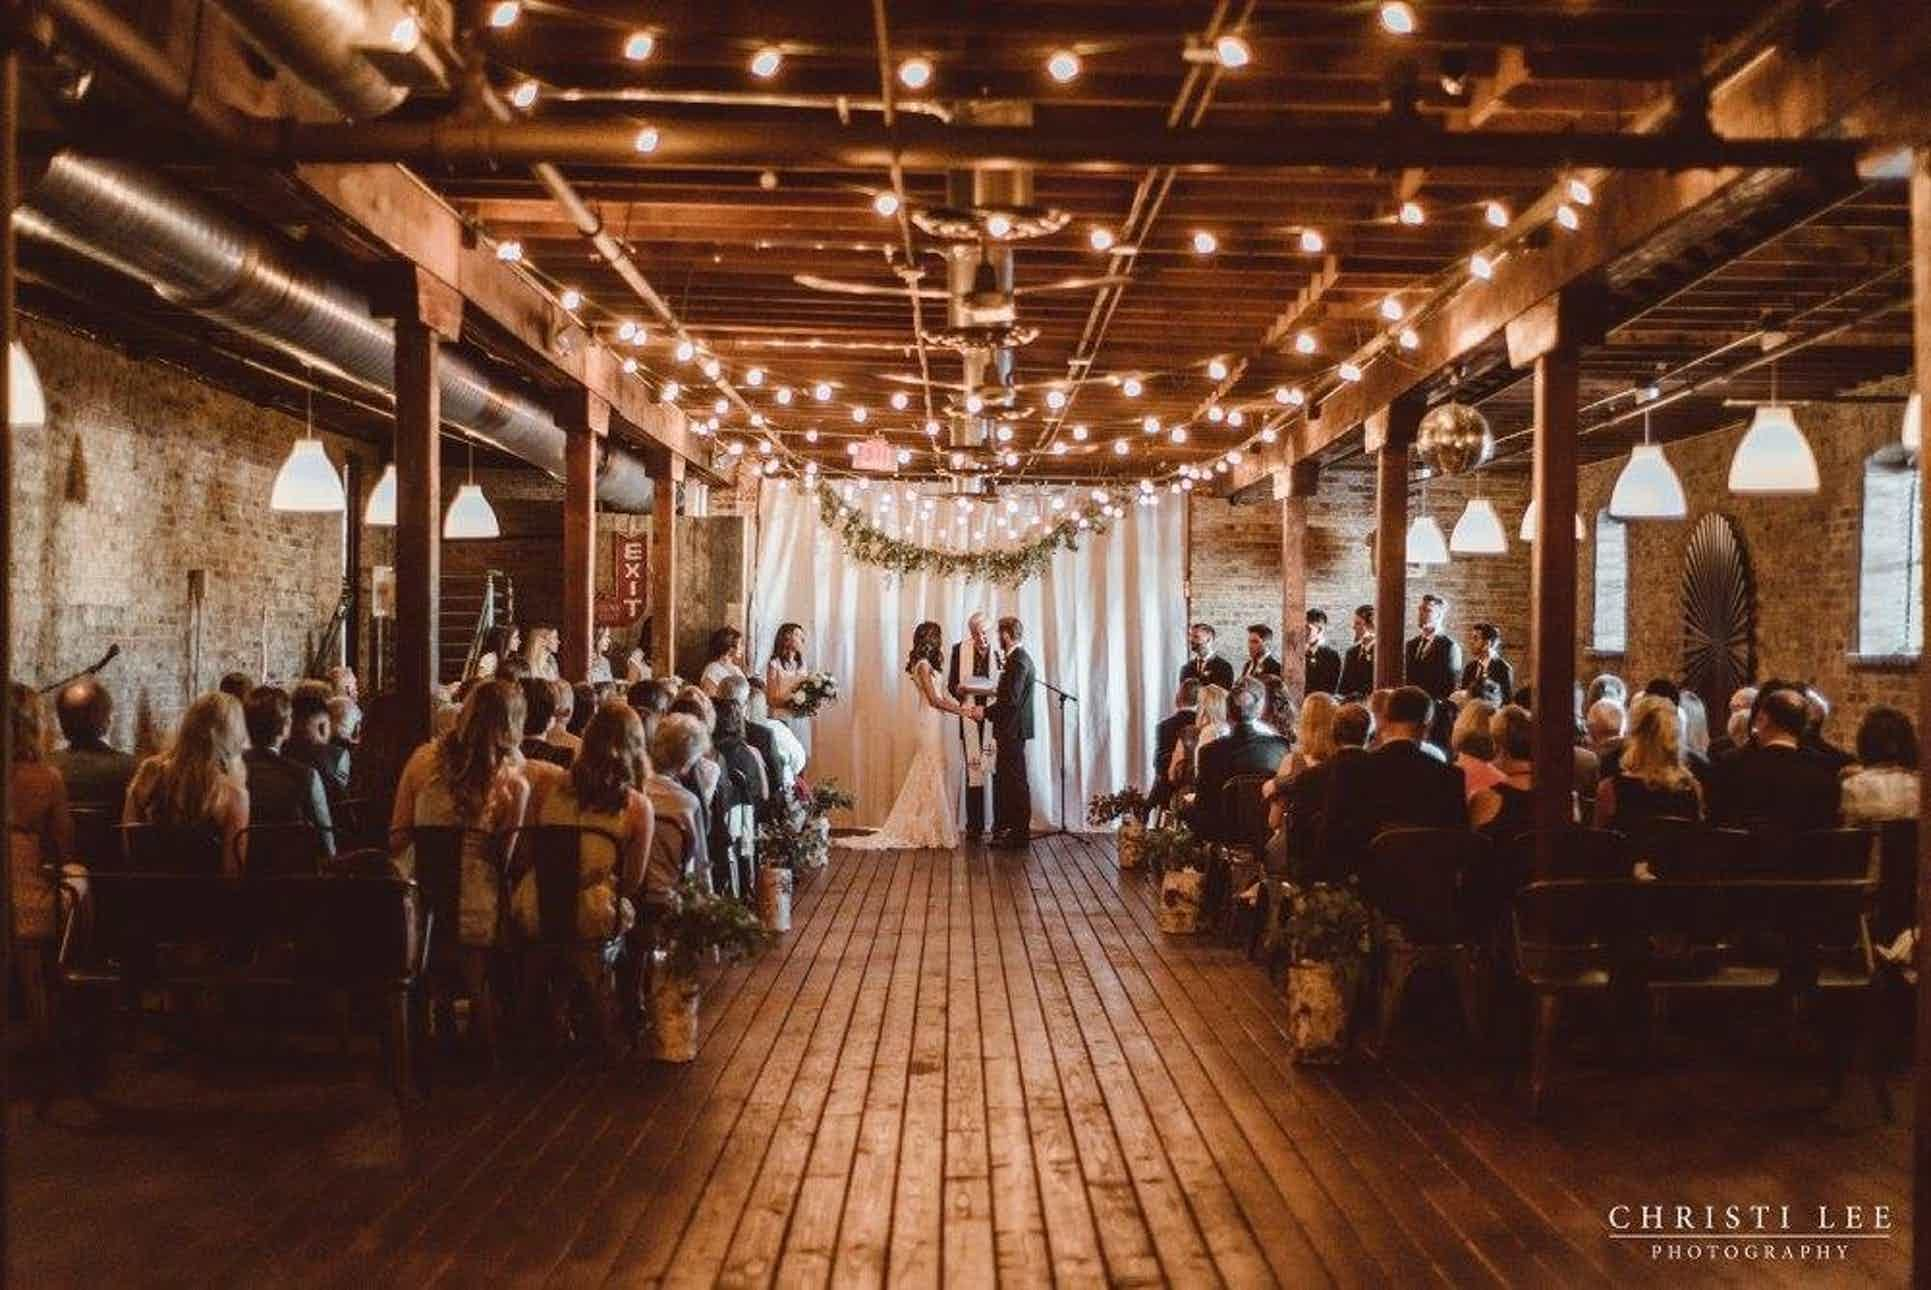 The Haight North Chicago Suburbs Wedding Venue Elgin Illinois 60120 Chicago Suburbs Wedding Cheap Wedding Venues Wedding Venues